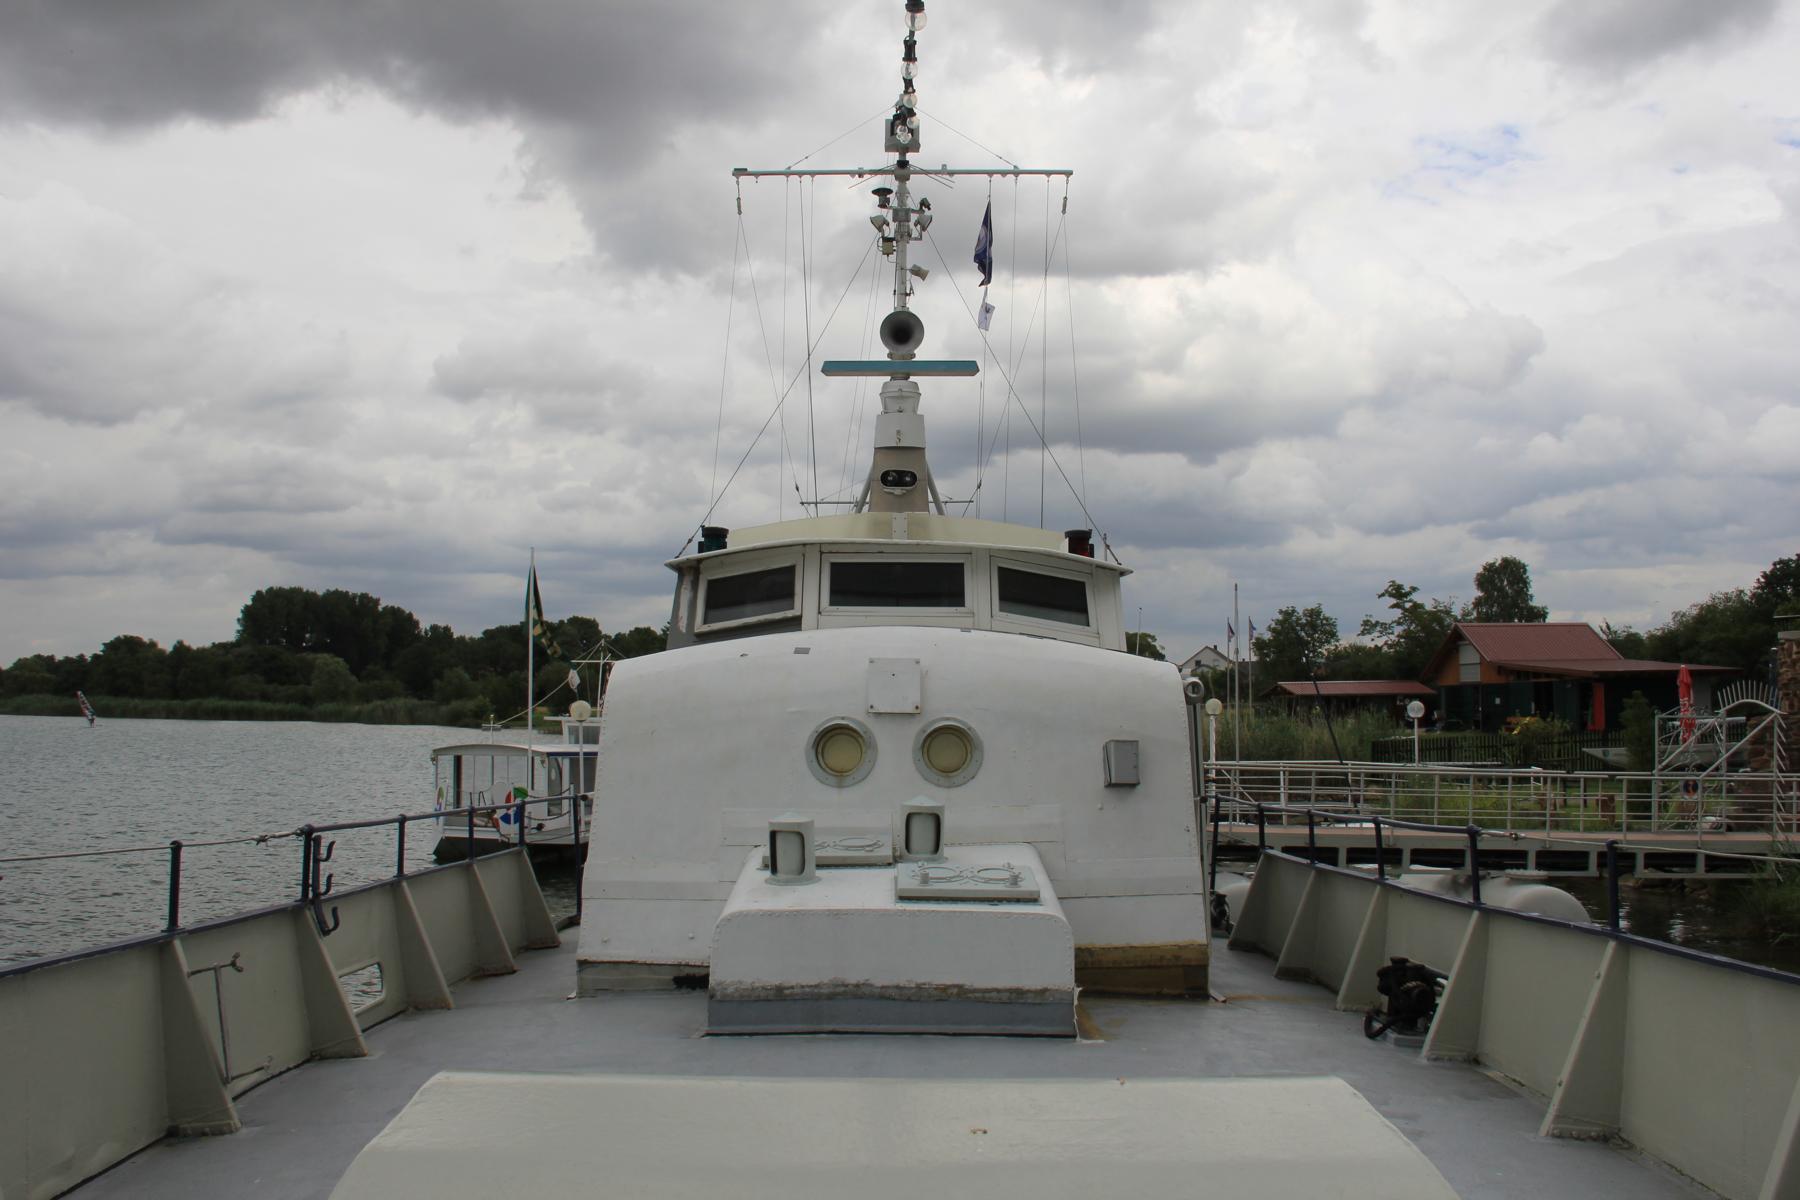 KW 18